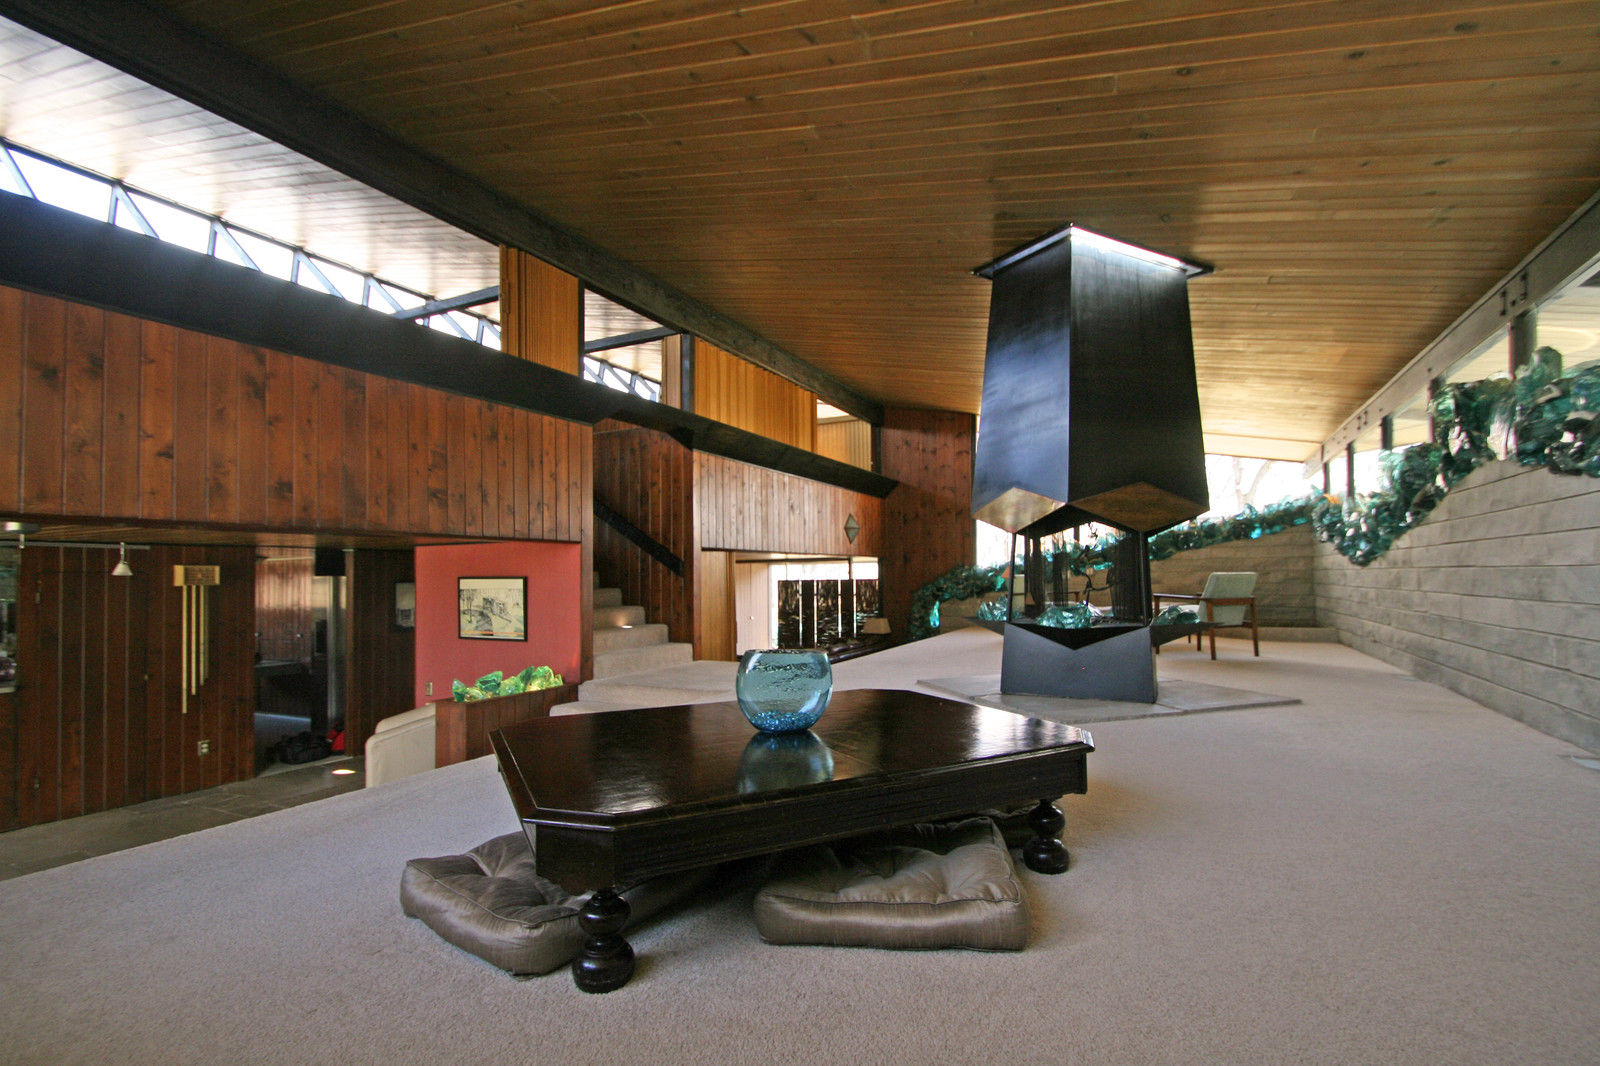 bruce-goff-architect-joslin-missouri-midcentury-modern-house-4.jpg